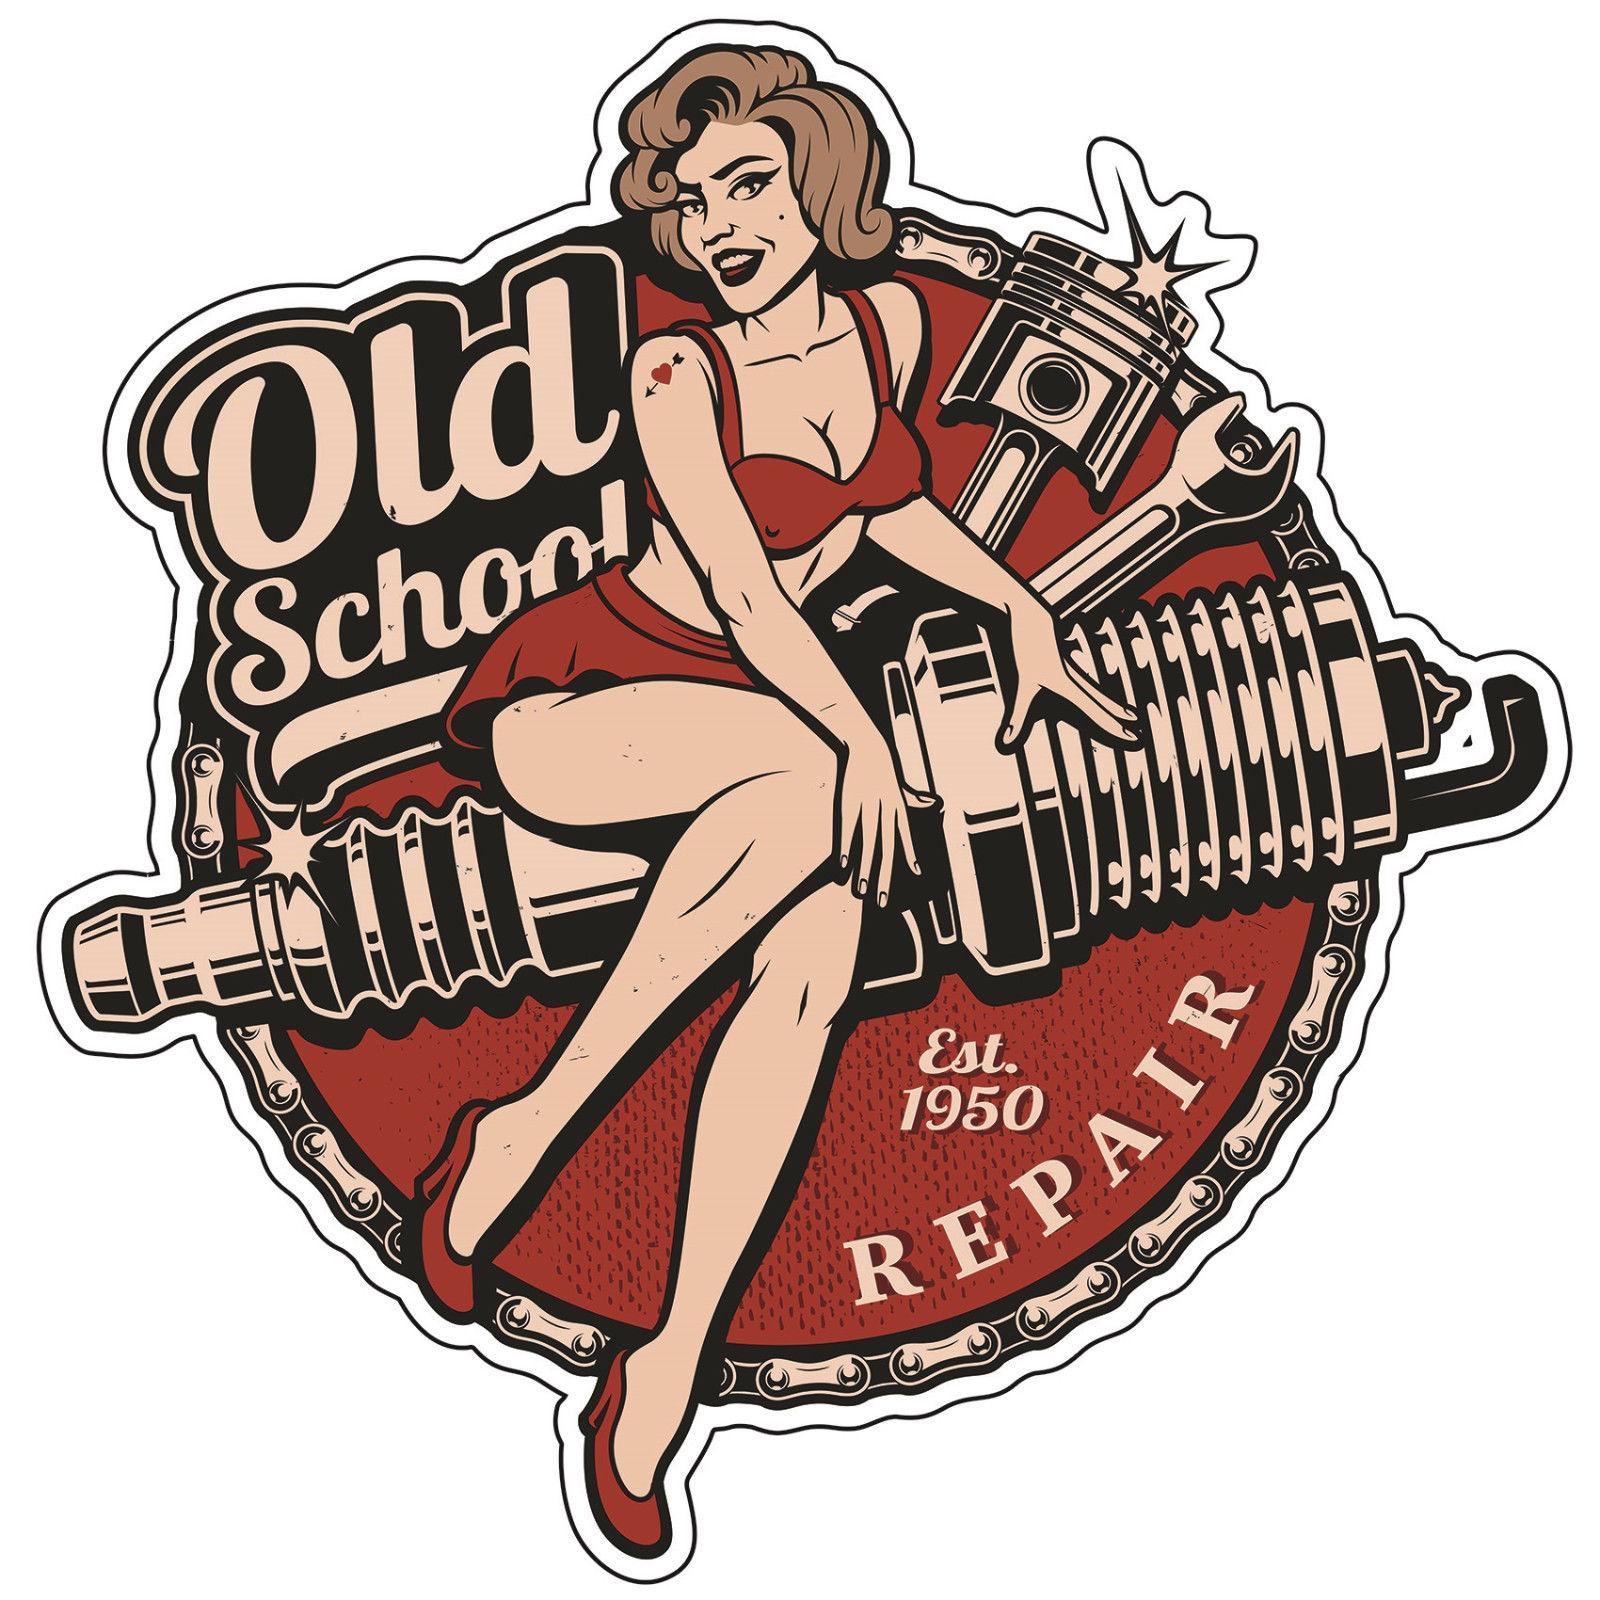 Pin Up Repair Girl Old School Sticker Bobber Cafe Racer Retro #22